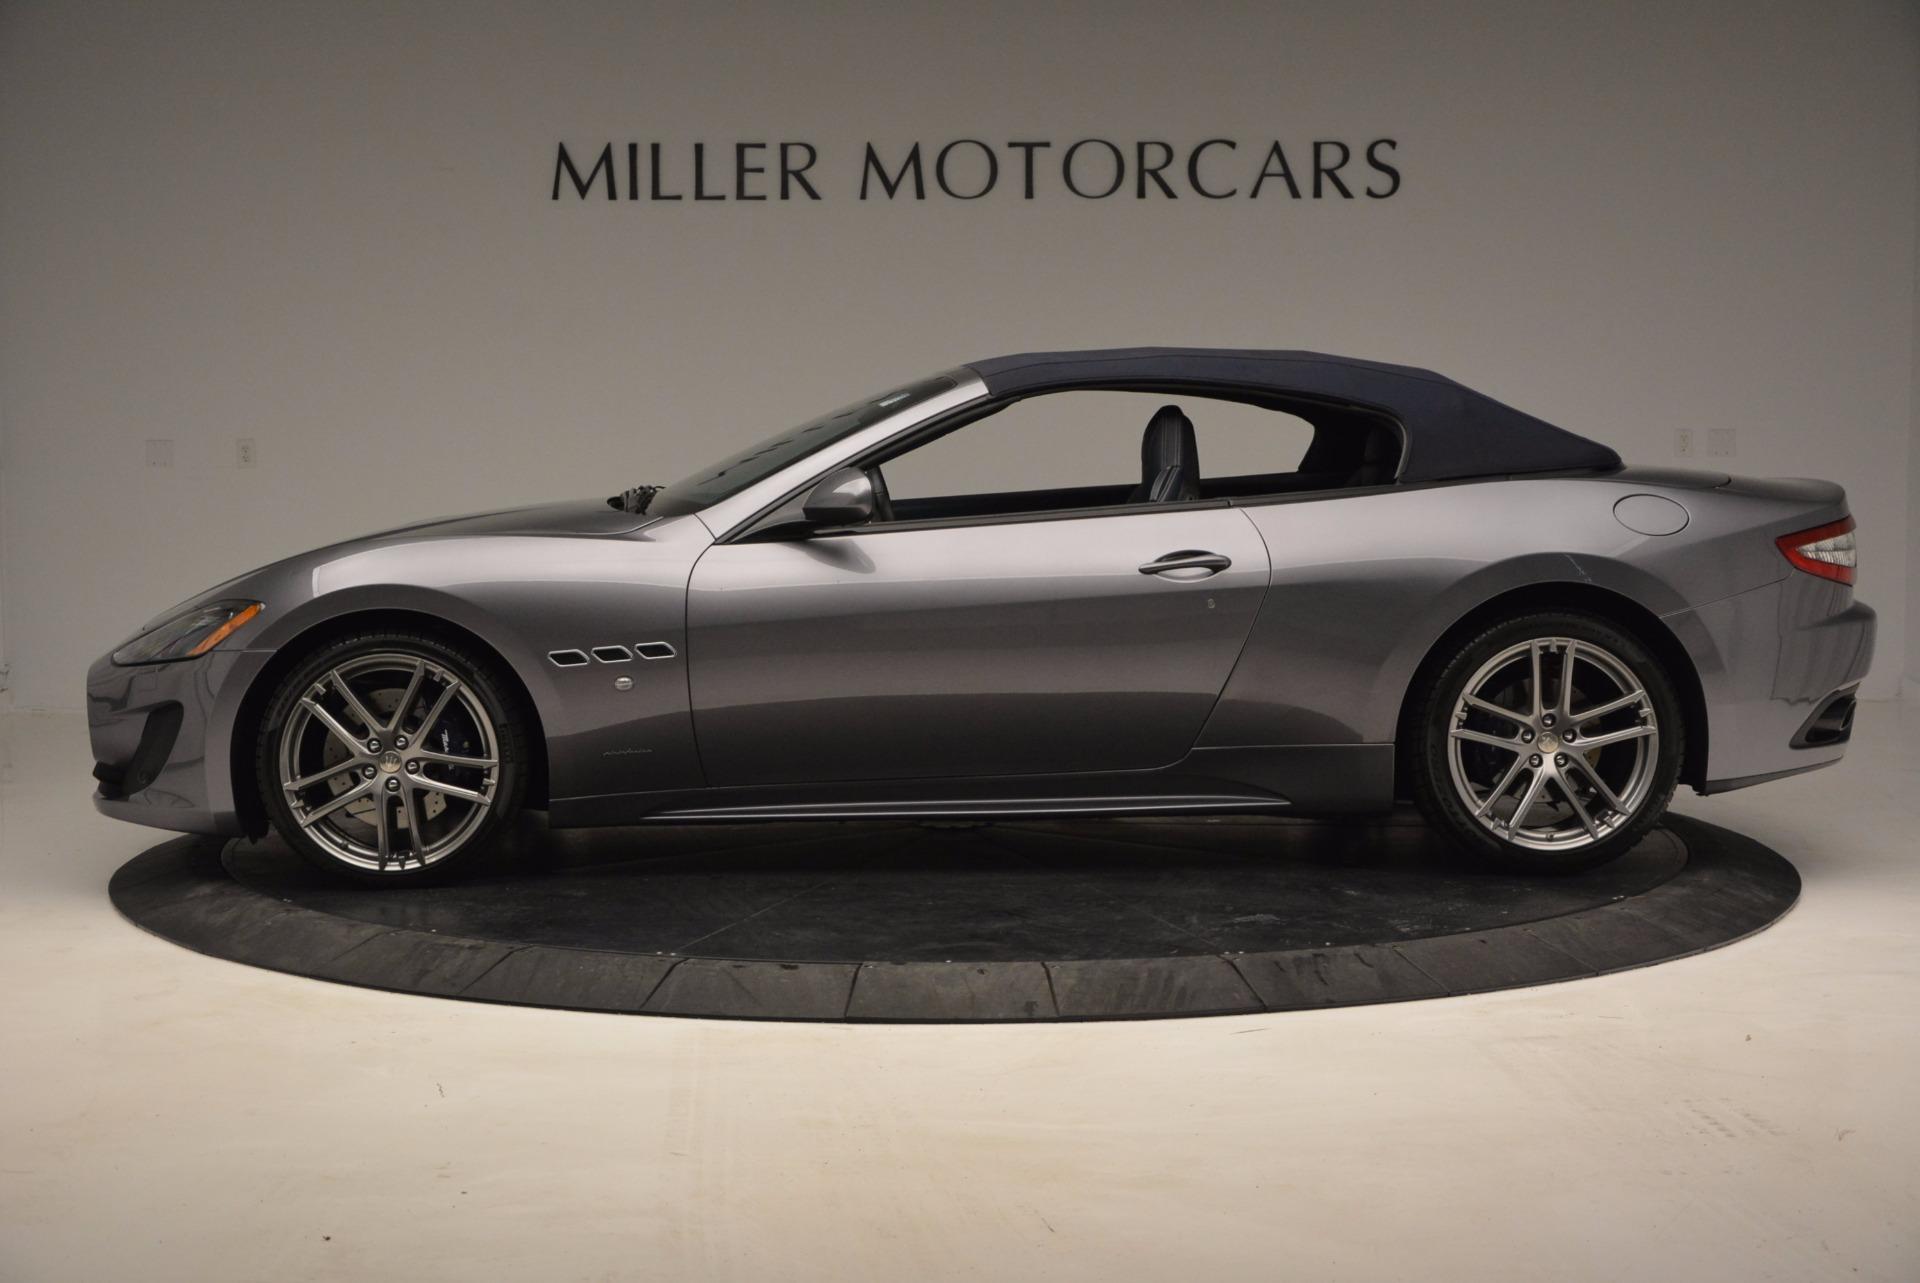 New 2016 Maserati GranTurismo Convertible Sport For Sale In Westport, CT 154_p12